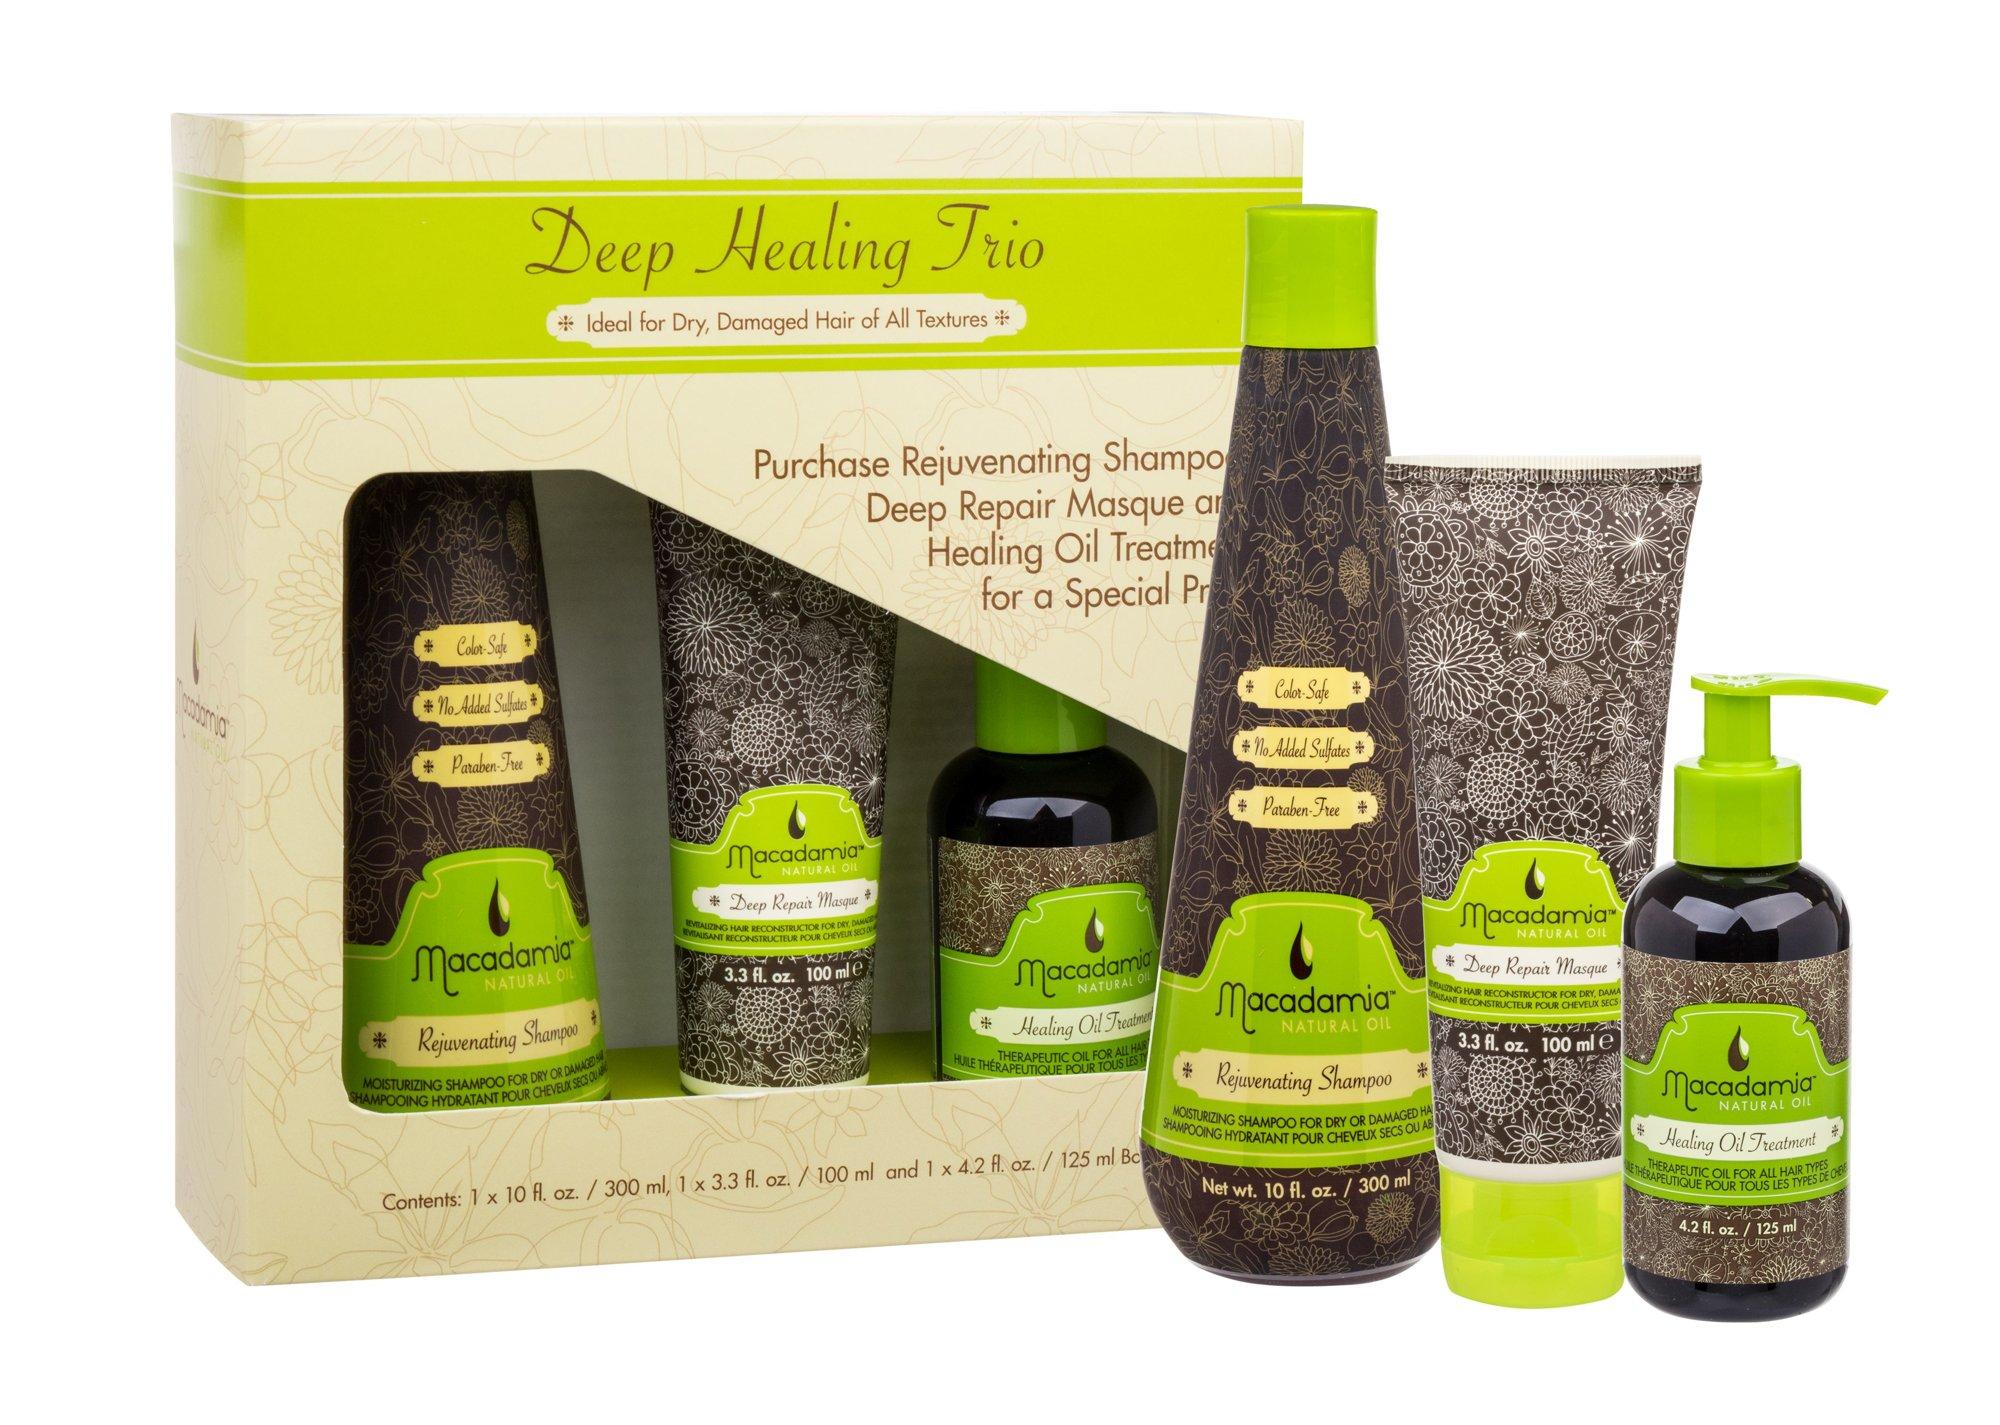 Macadamia Deep Healing Trio Kit Cosmetic 300ml